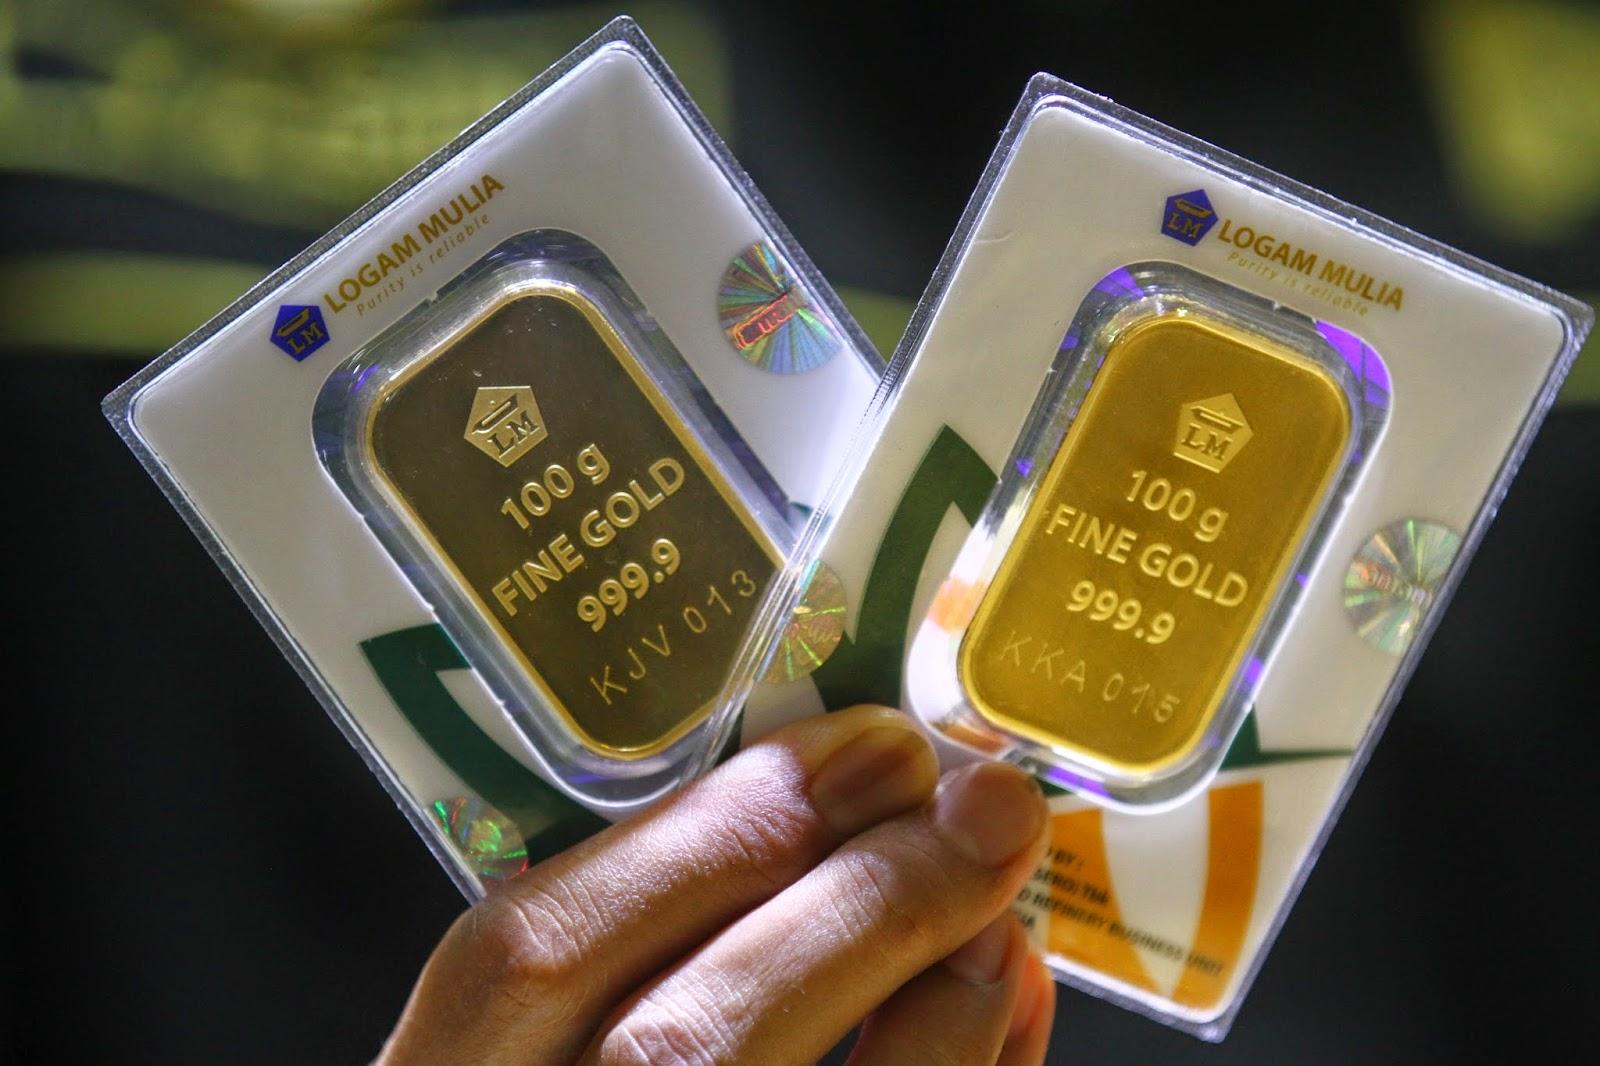 Lm Antam Kemasan Baru Guide To Investasi Emas